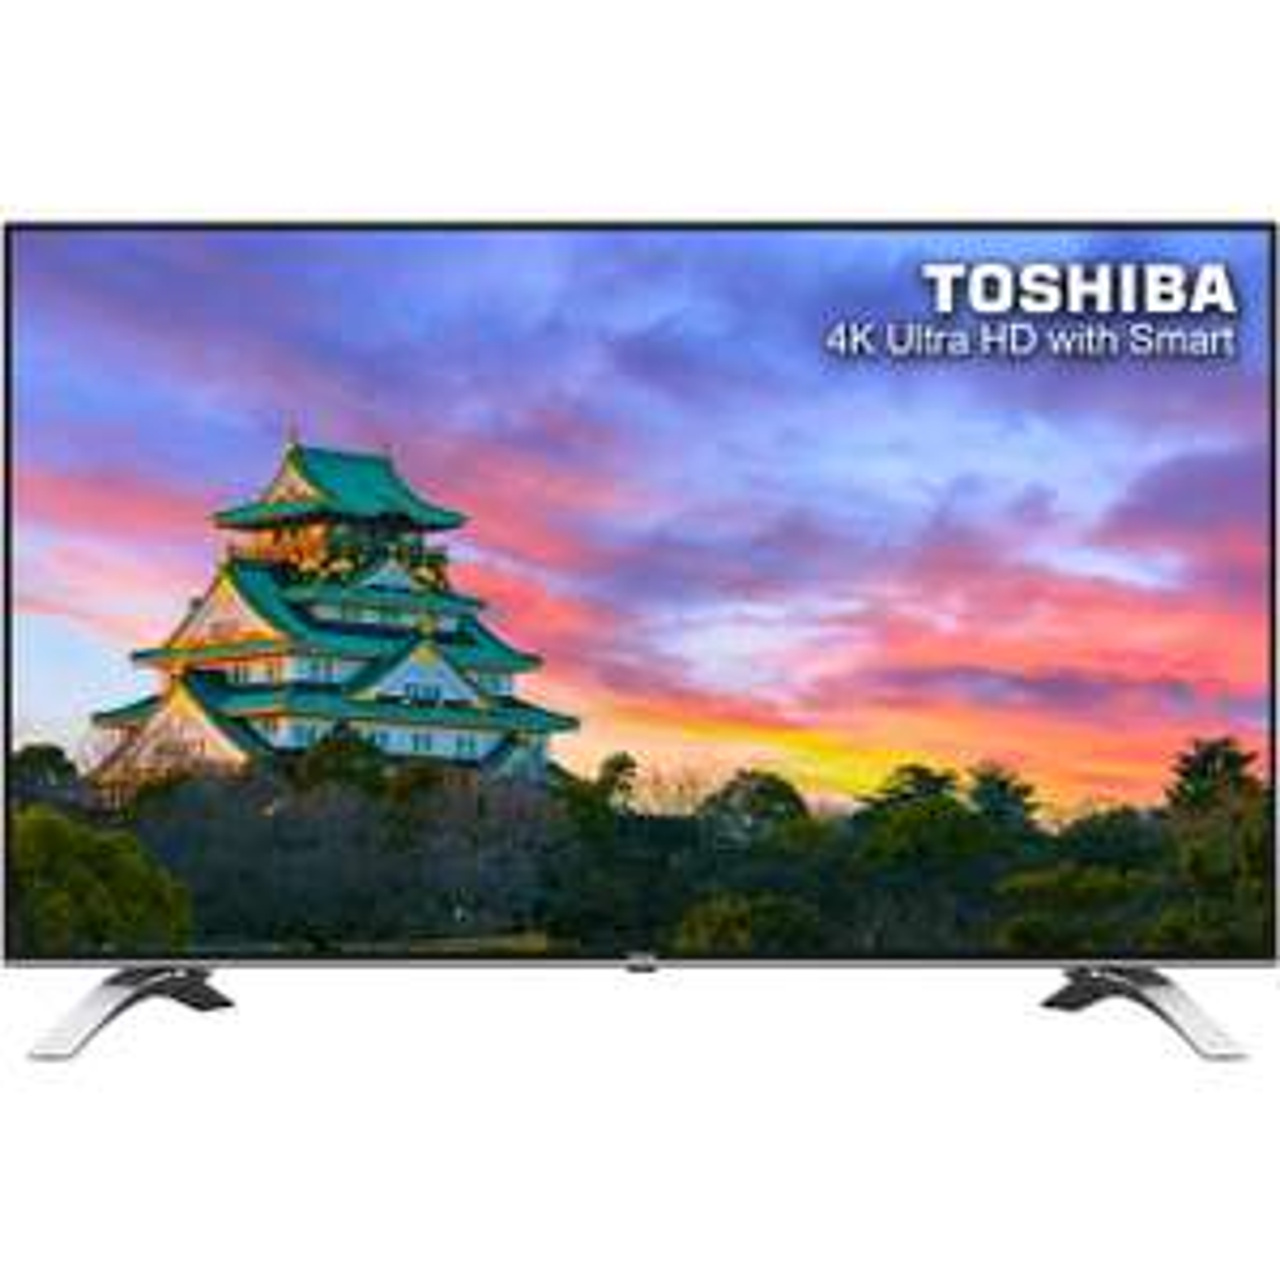 "Toshiba 55U6663DB 55"" Smart 4K Ultra HD TV - Black - [A+ Rated] £379 from ao.com"